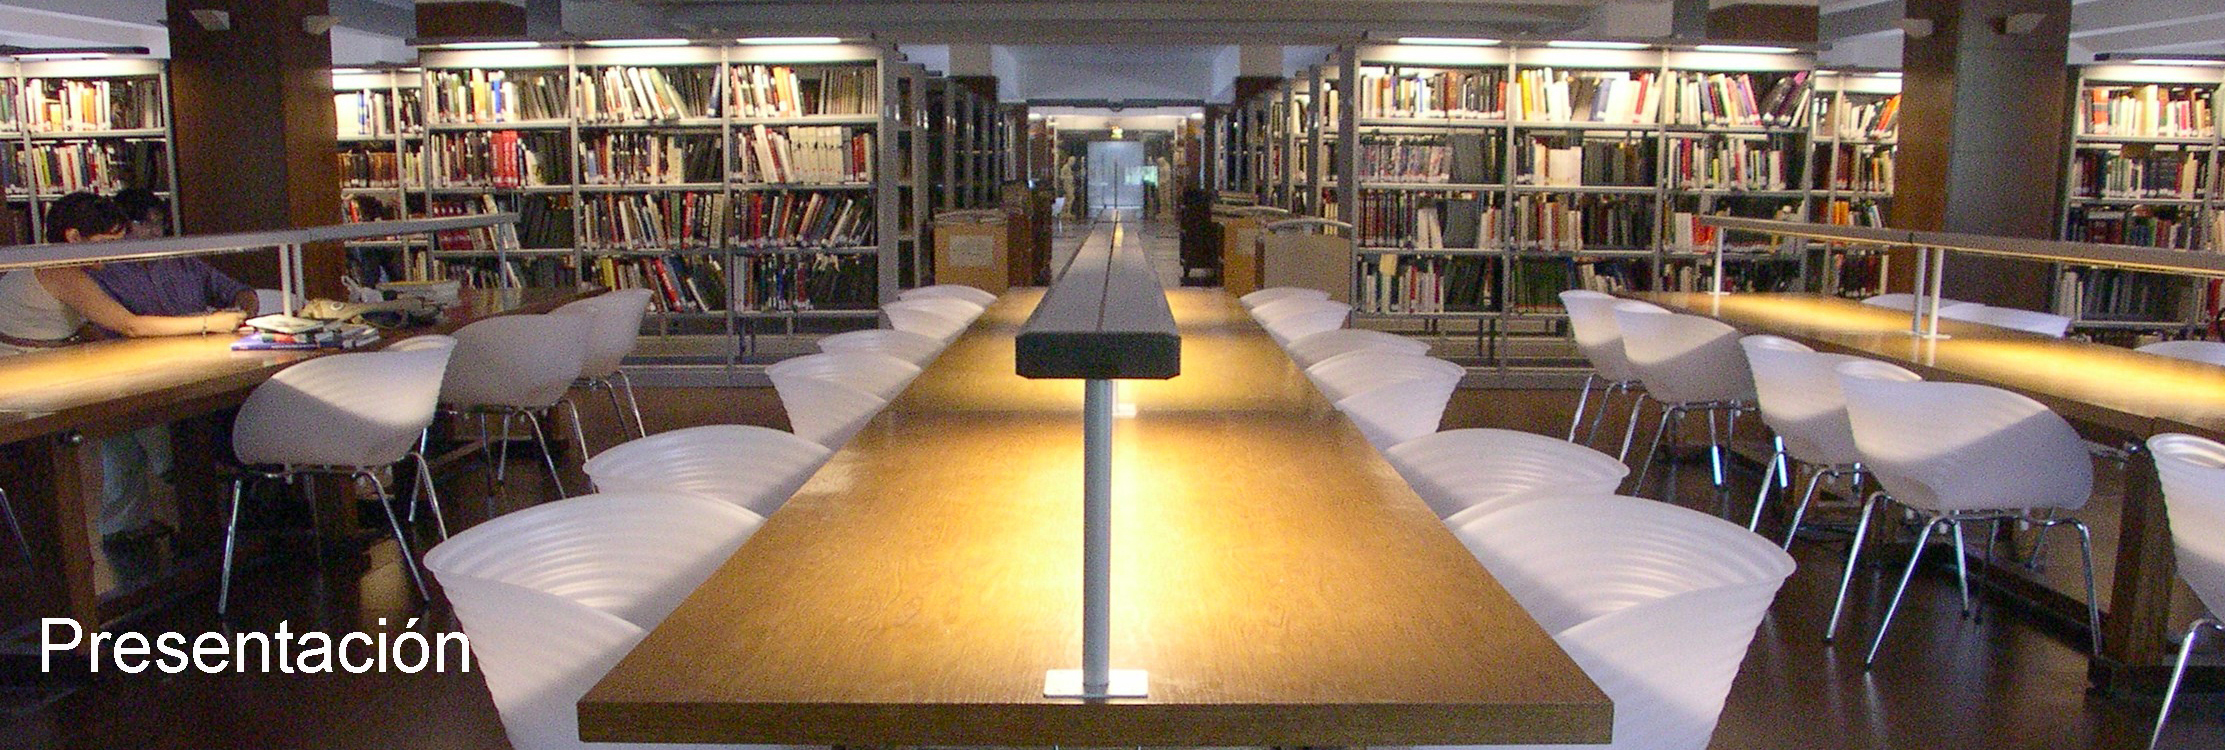 Bibliotecaetsampresentacion - Ets arquitectura madrid ...